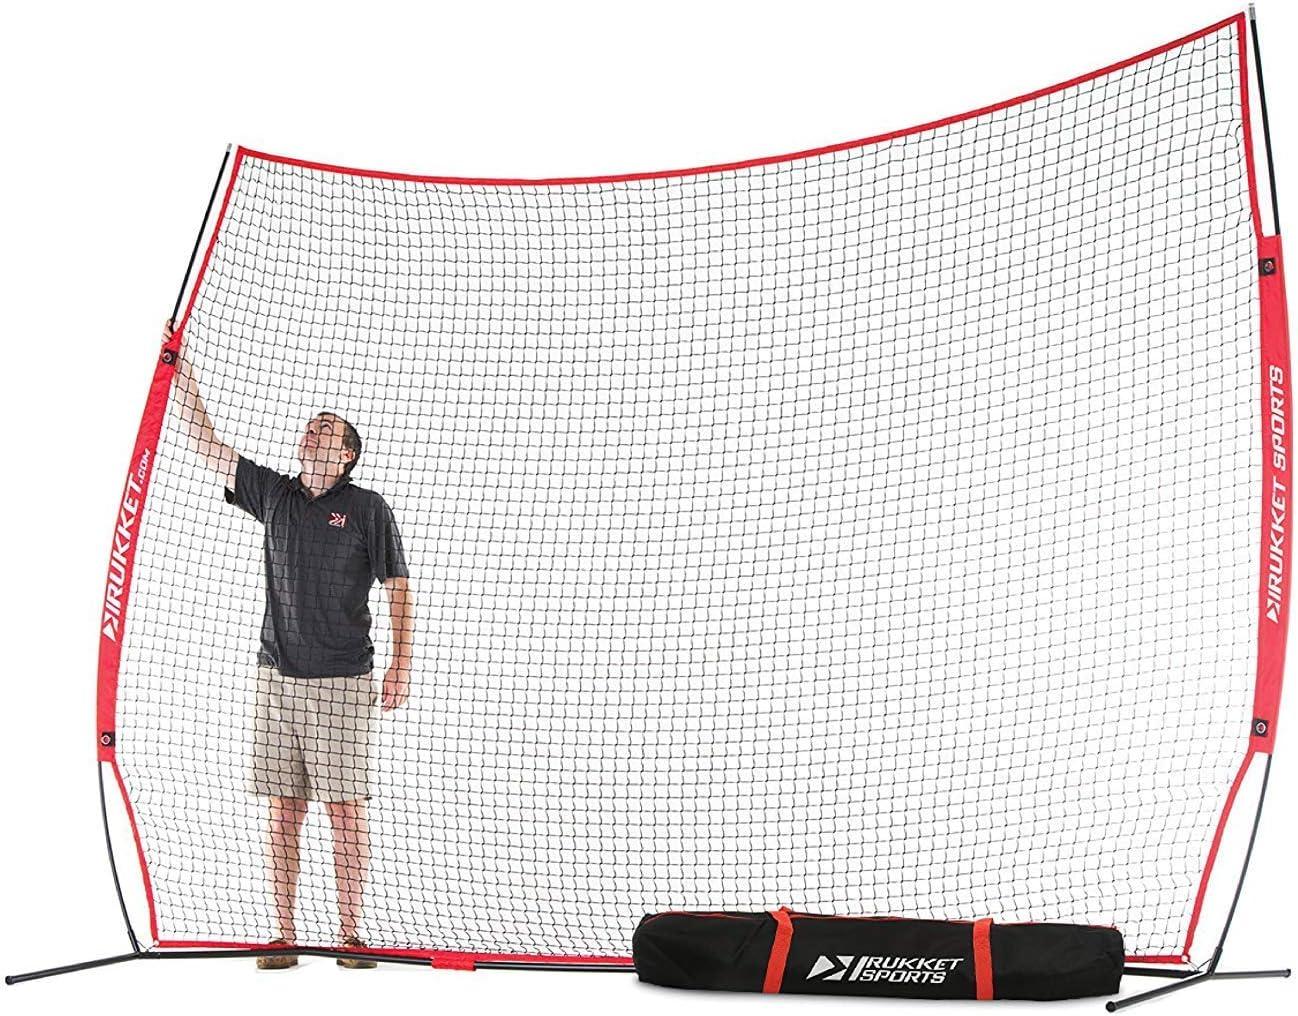 Rukket Barricade Backstop Net | Indoor and Outdoor Lacrosse, Basketball, Soccer, Field Hockey, Baseball, Softball Barrier Netting for Backyard, Park, and Residential Use